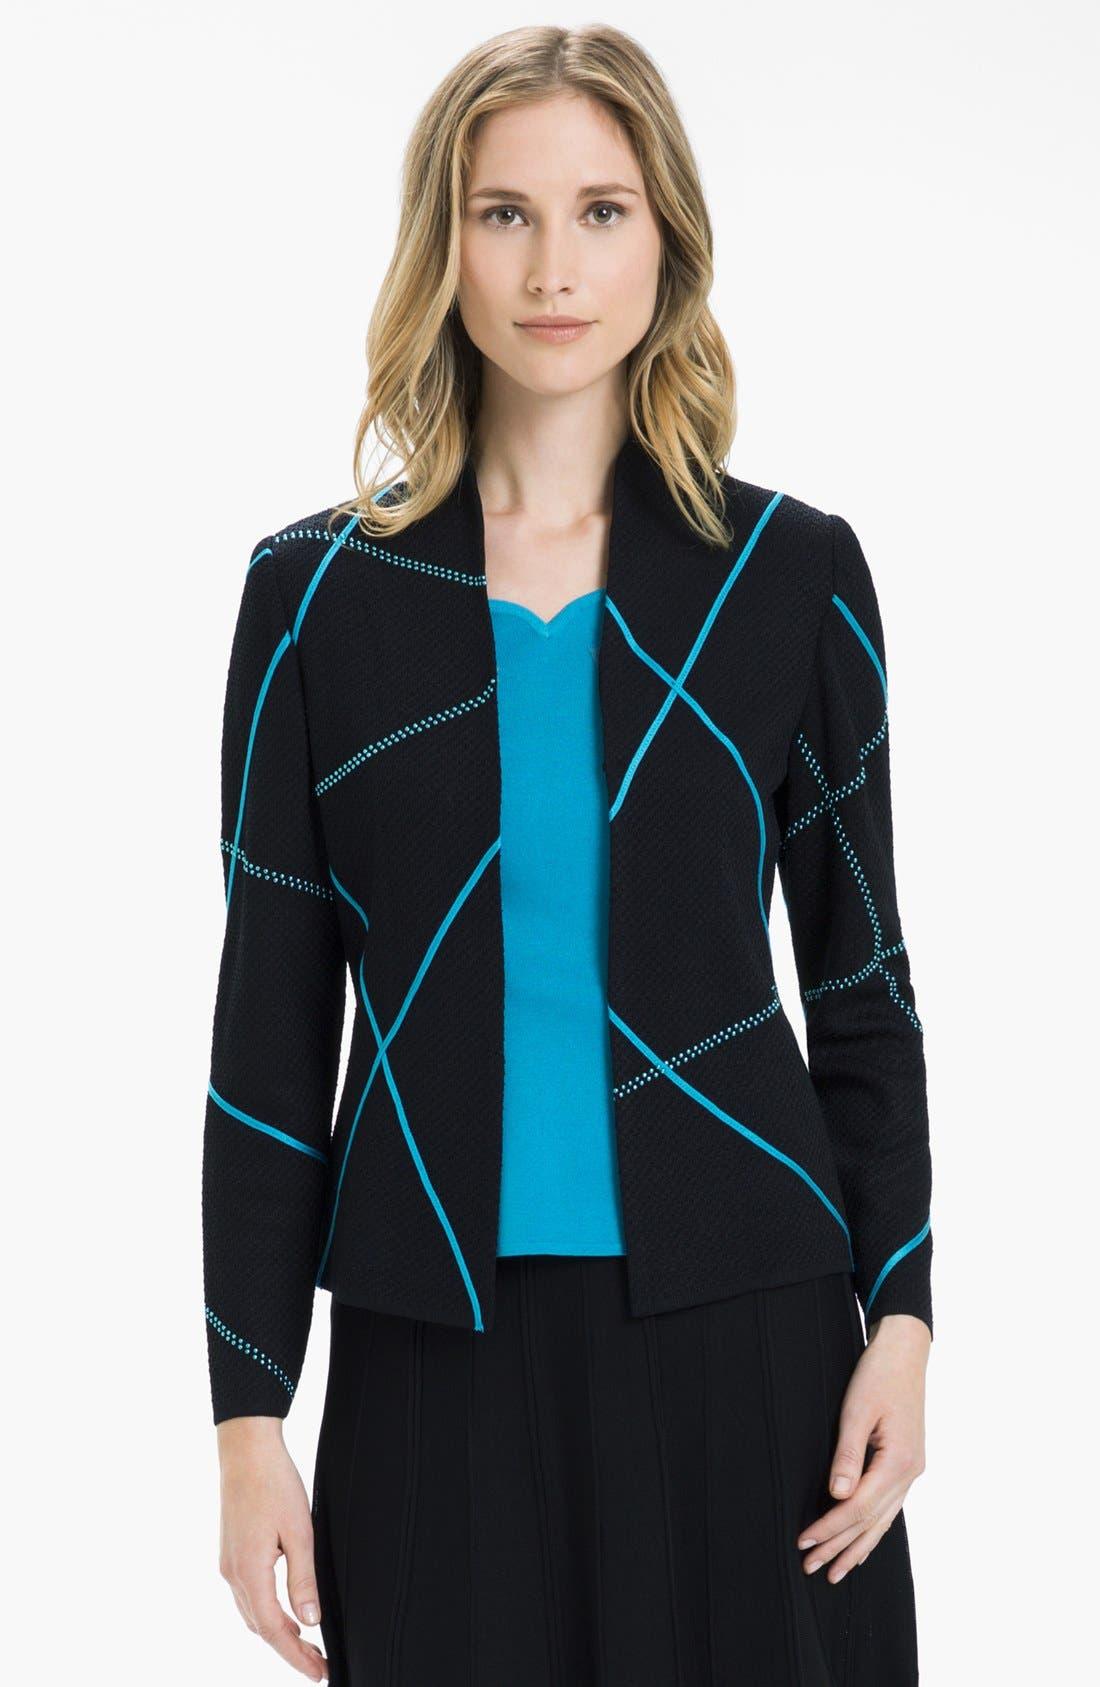 Alternate Image 1 Selected - Ming Wang Embellished Mock Neck Jacket